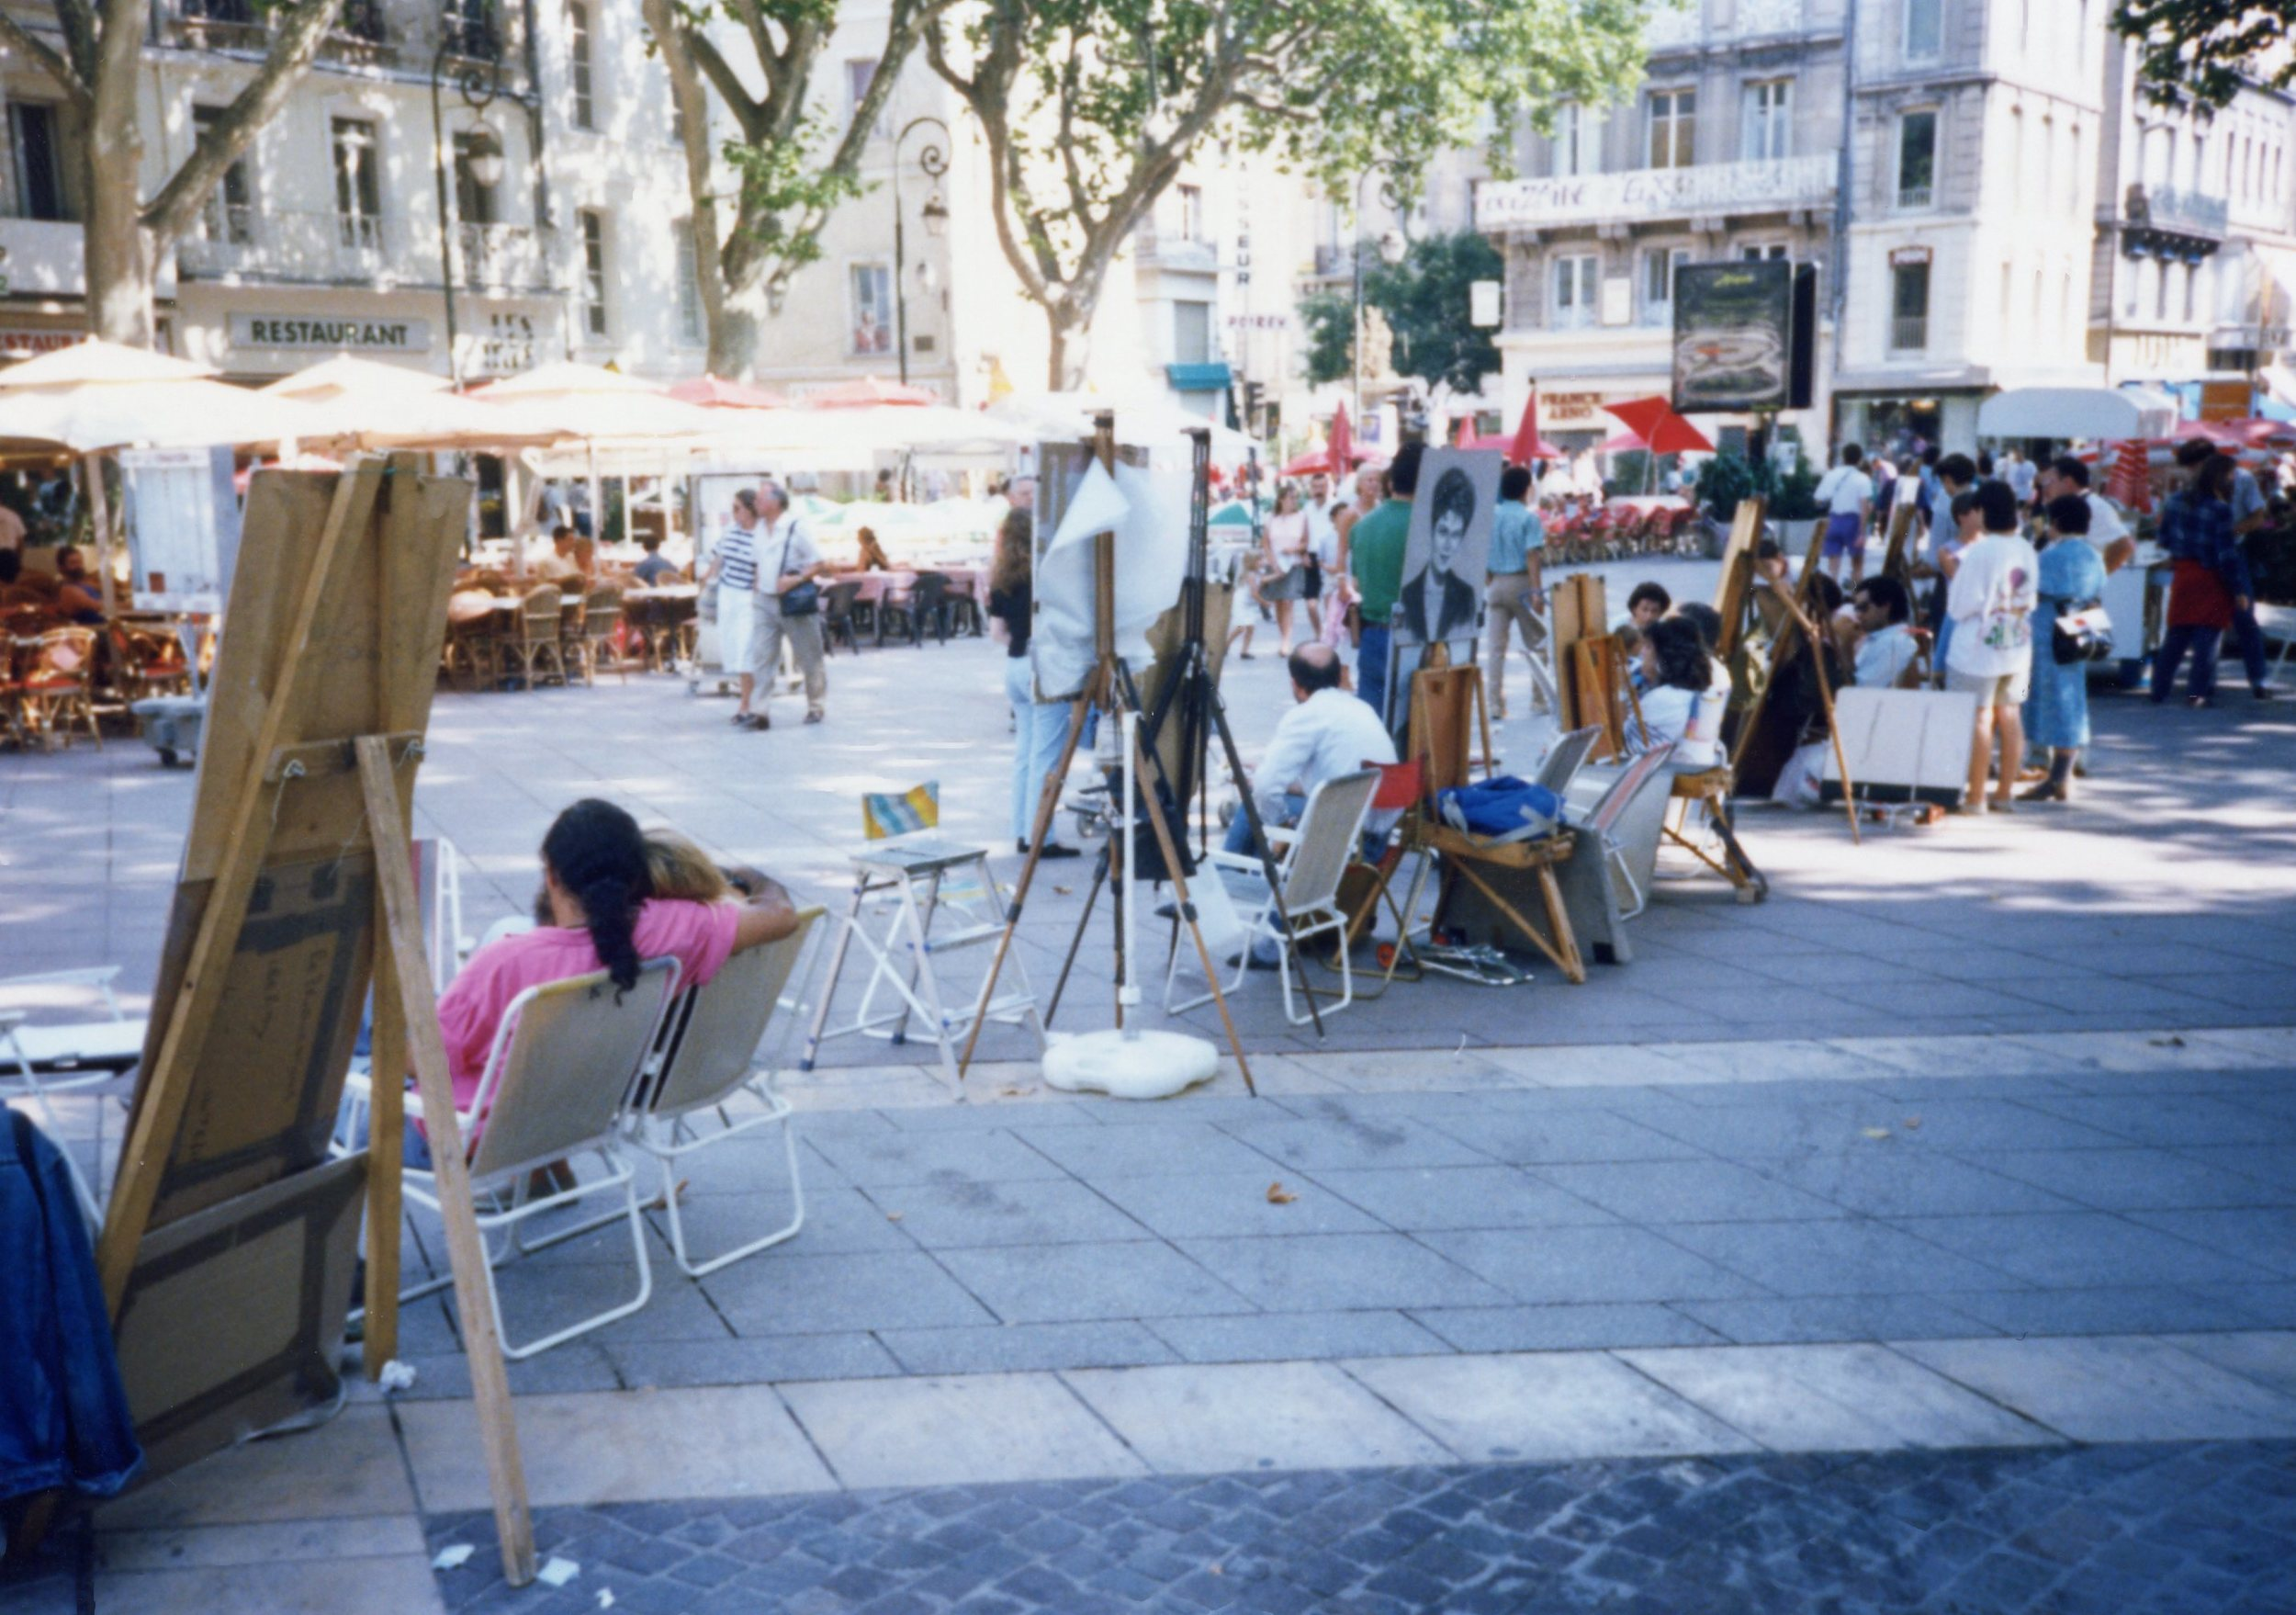 Streets of Avignon, 1990